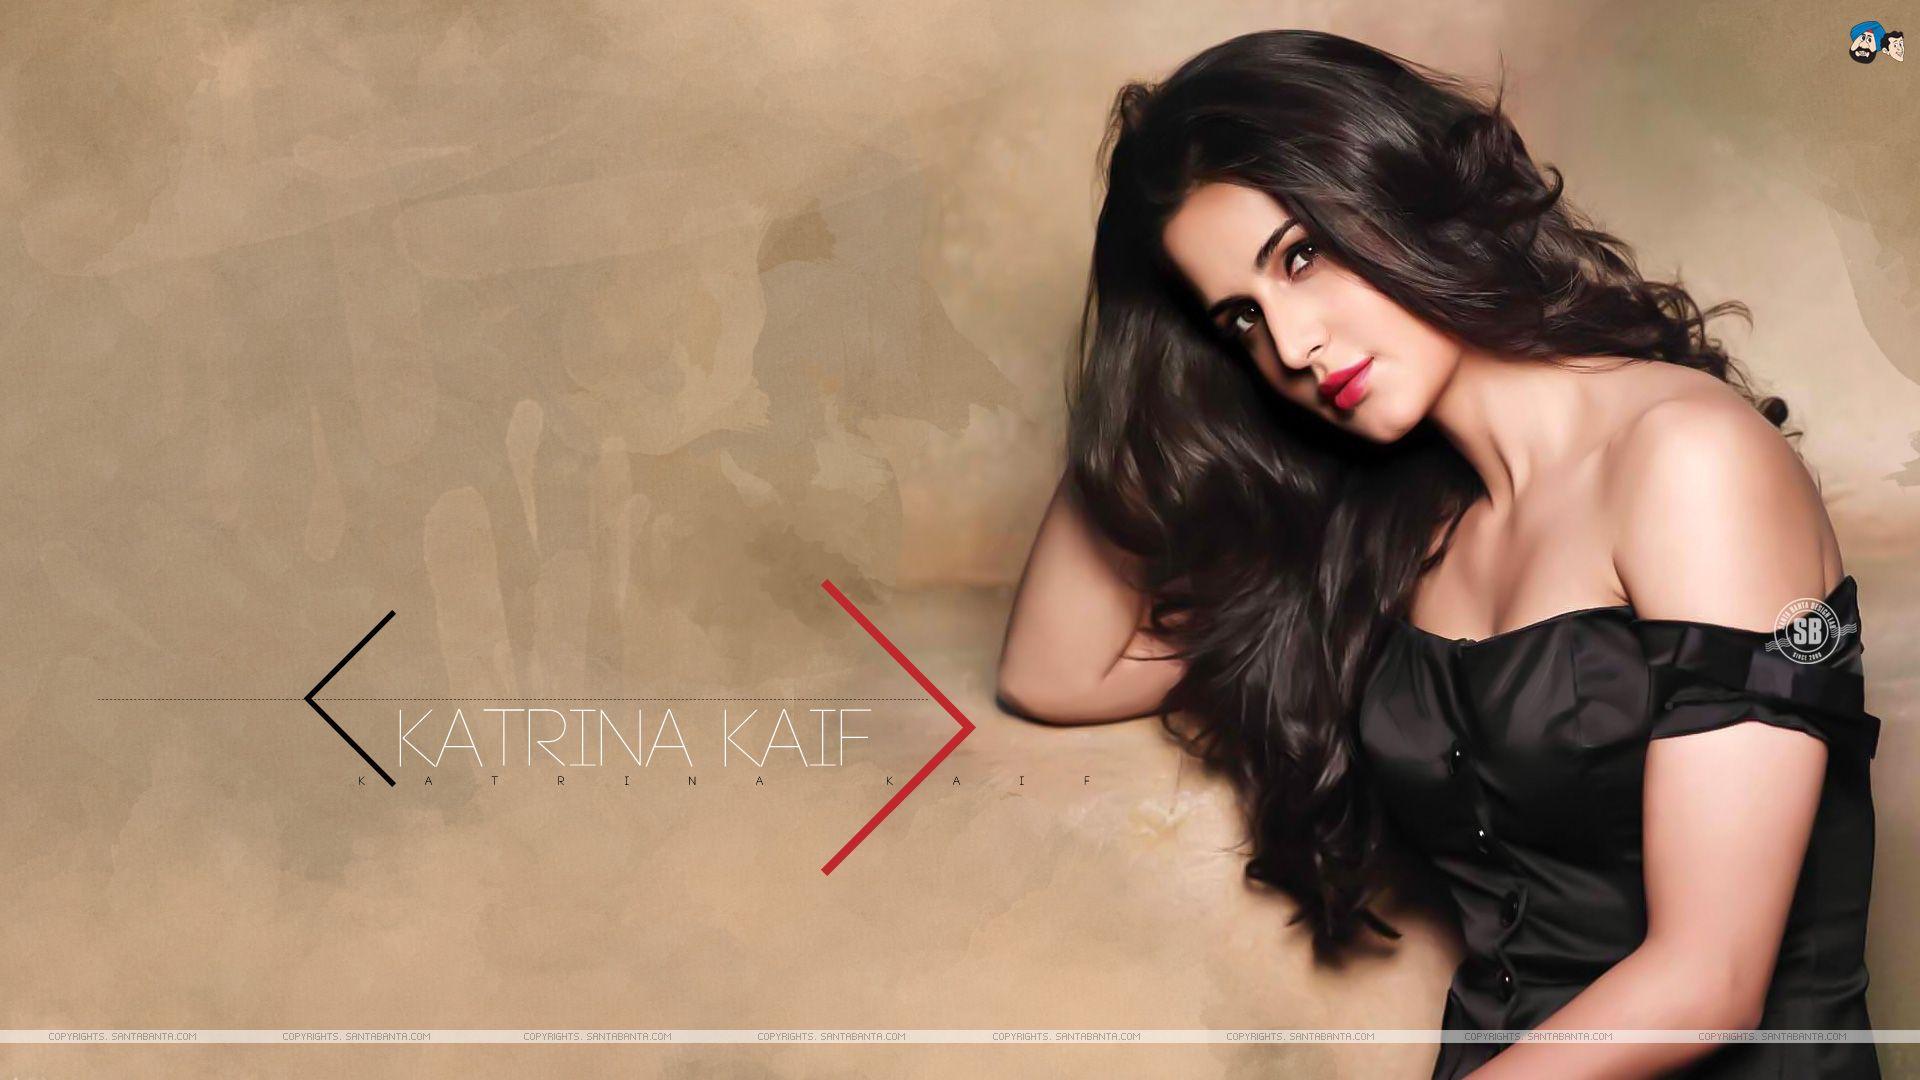 Katrina Kaif Hot Wallpaper Katrina Kaif Wallpapers